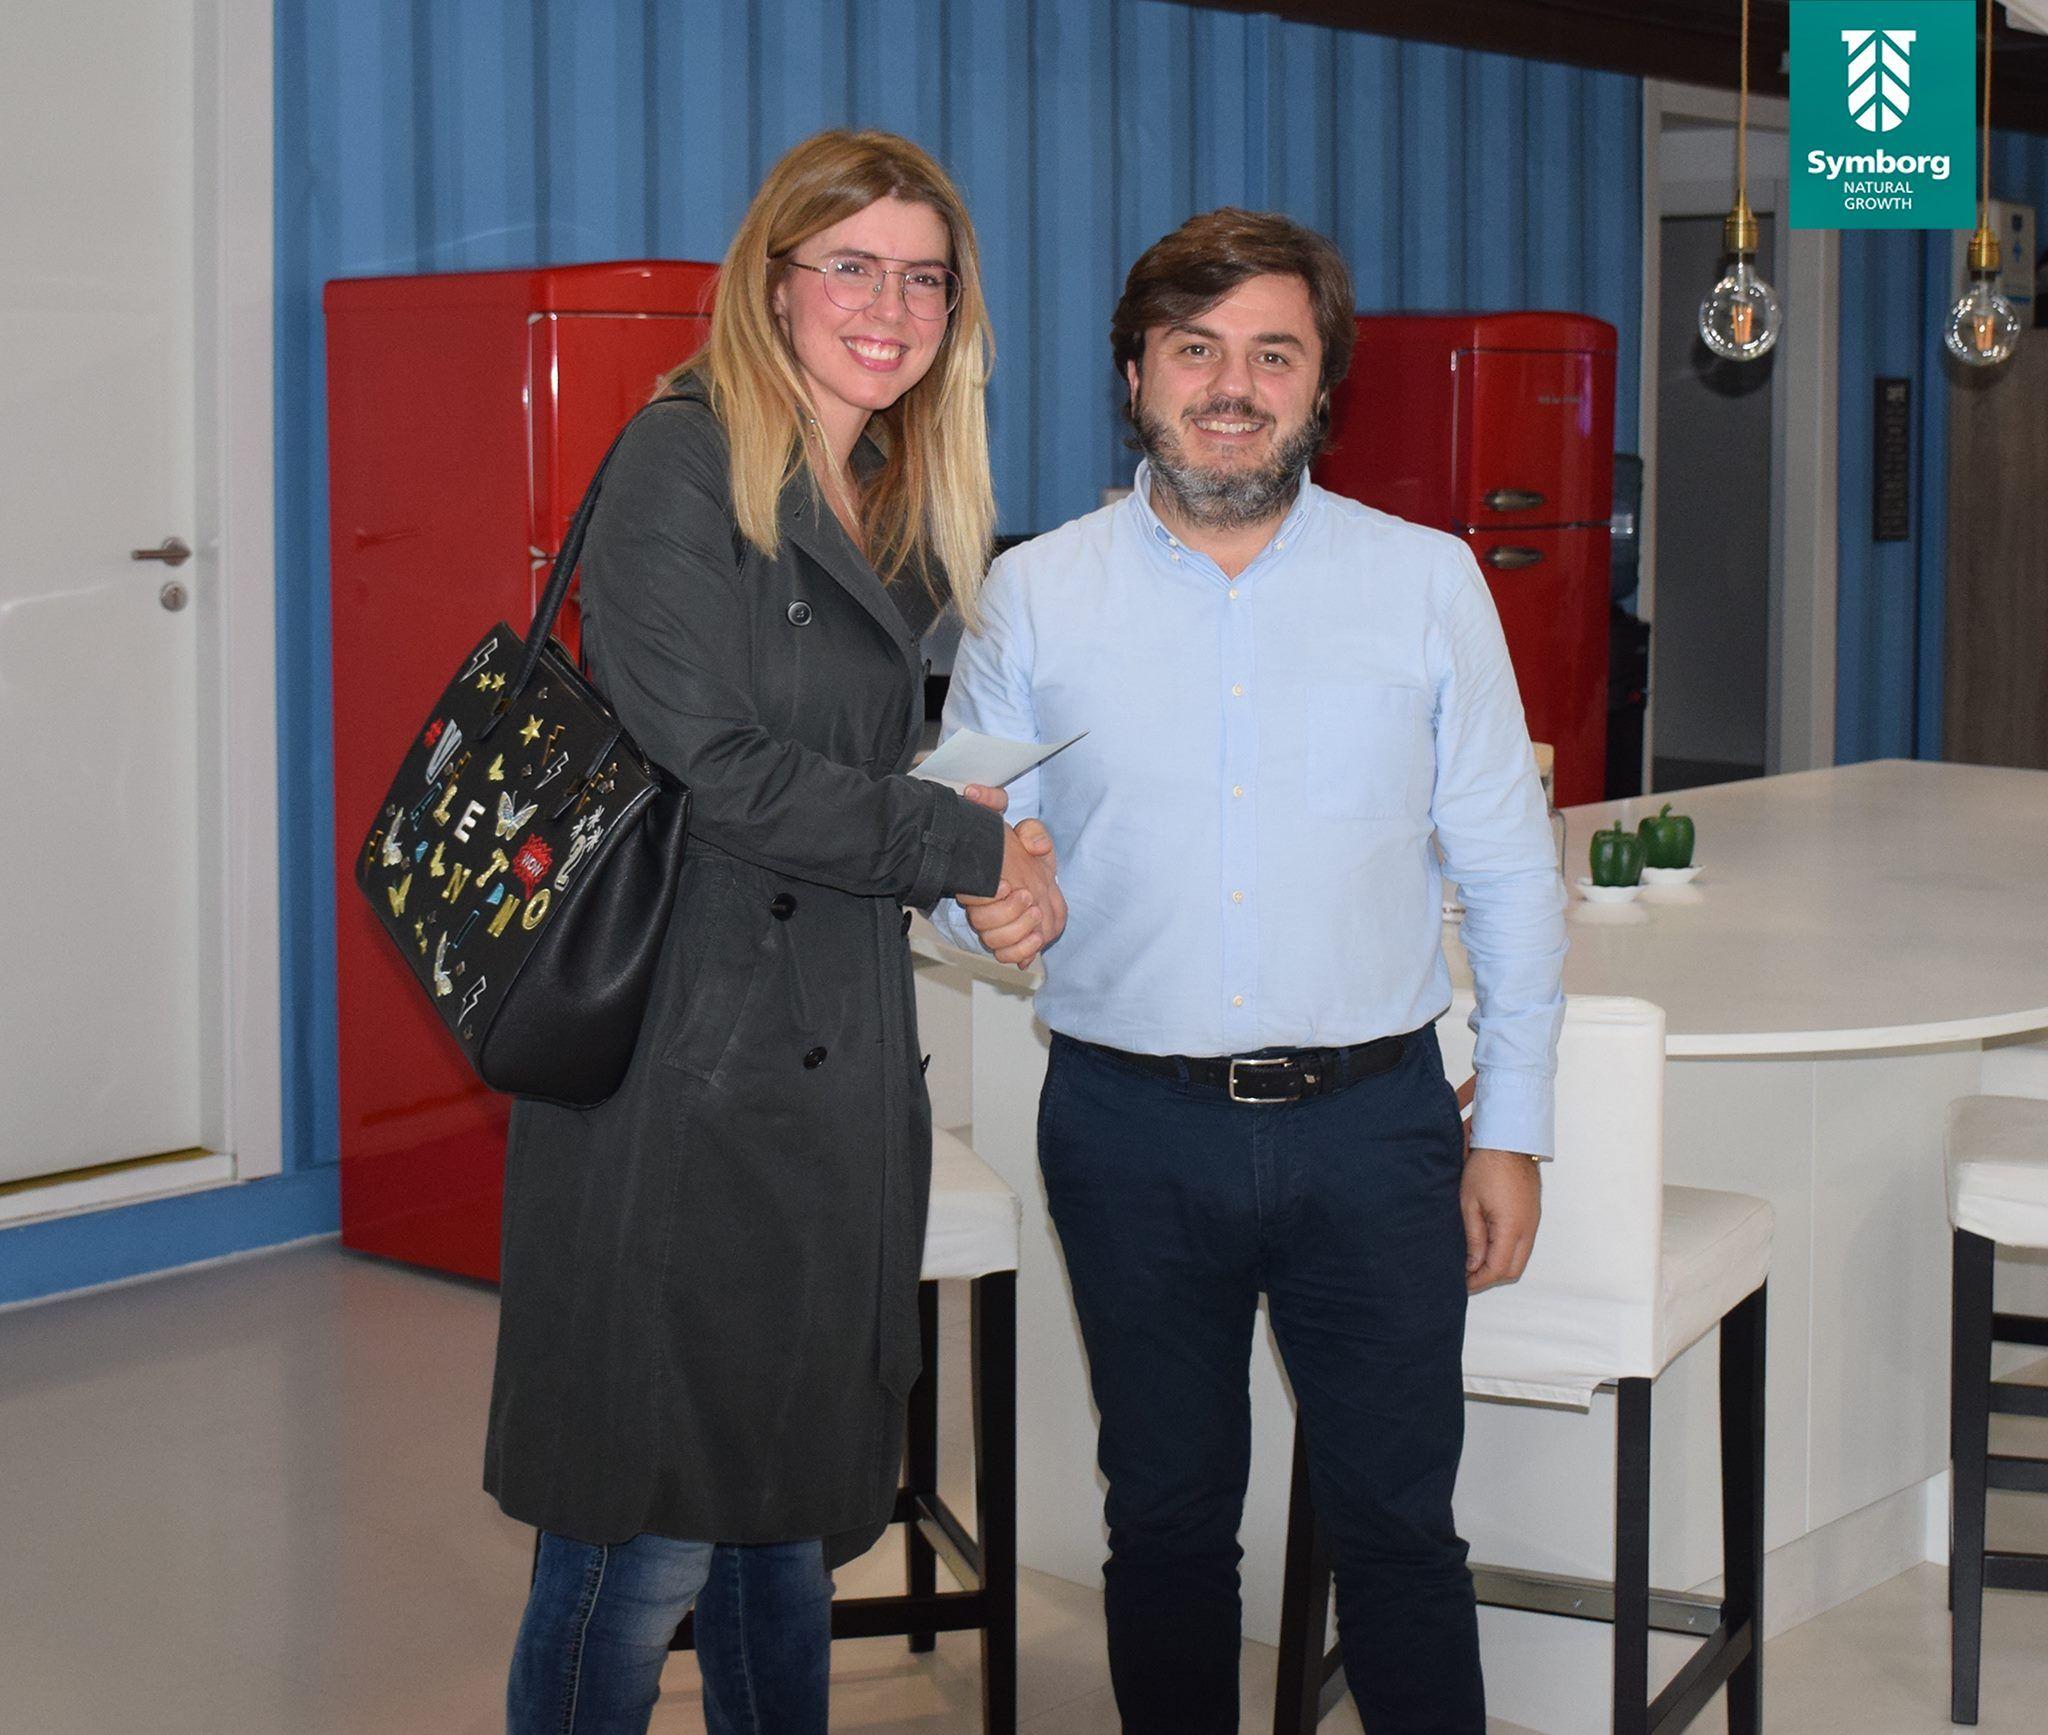 Foto de Jesús Juárez, CEO de Symborg, junto a Cristina Castillo,